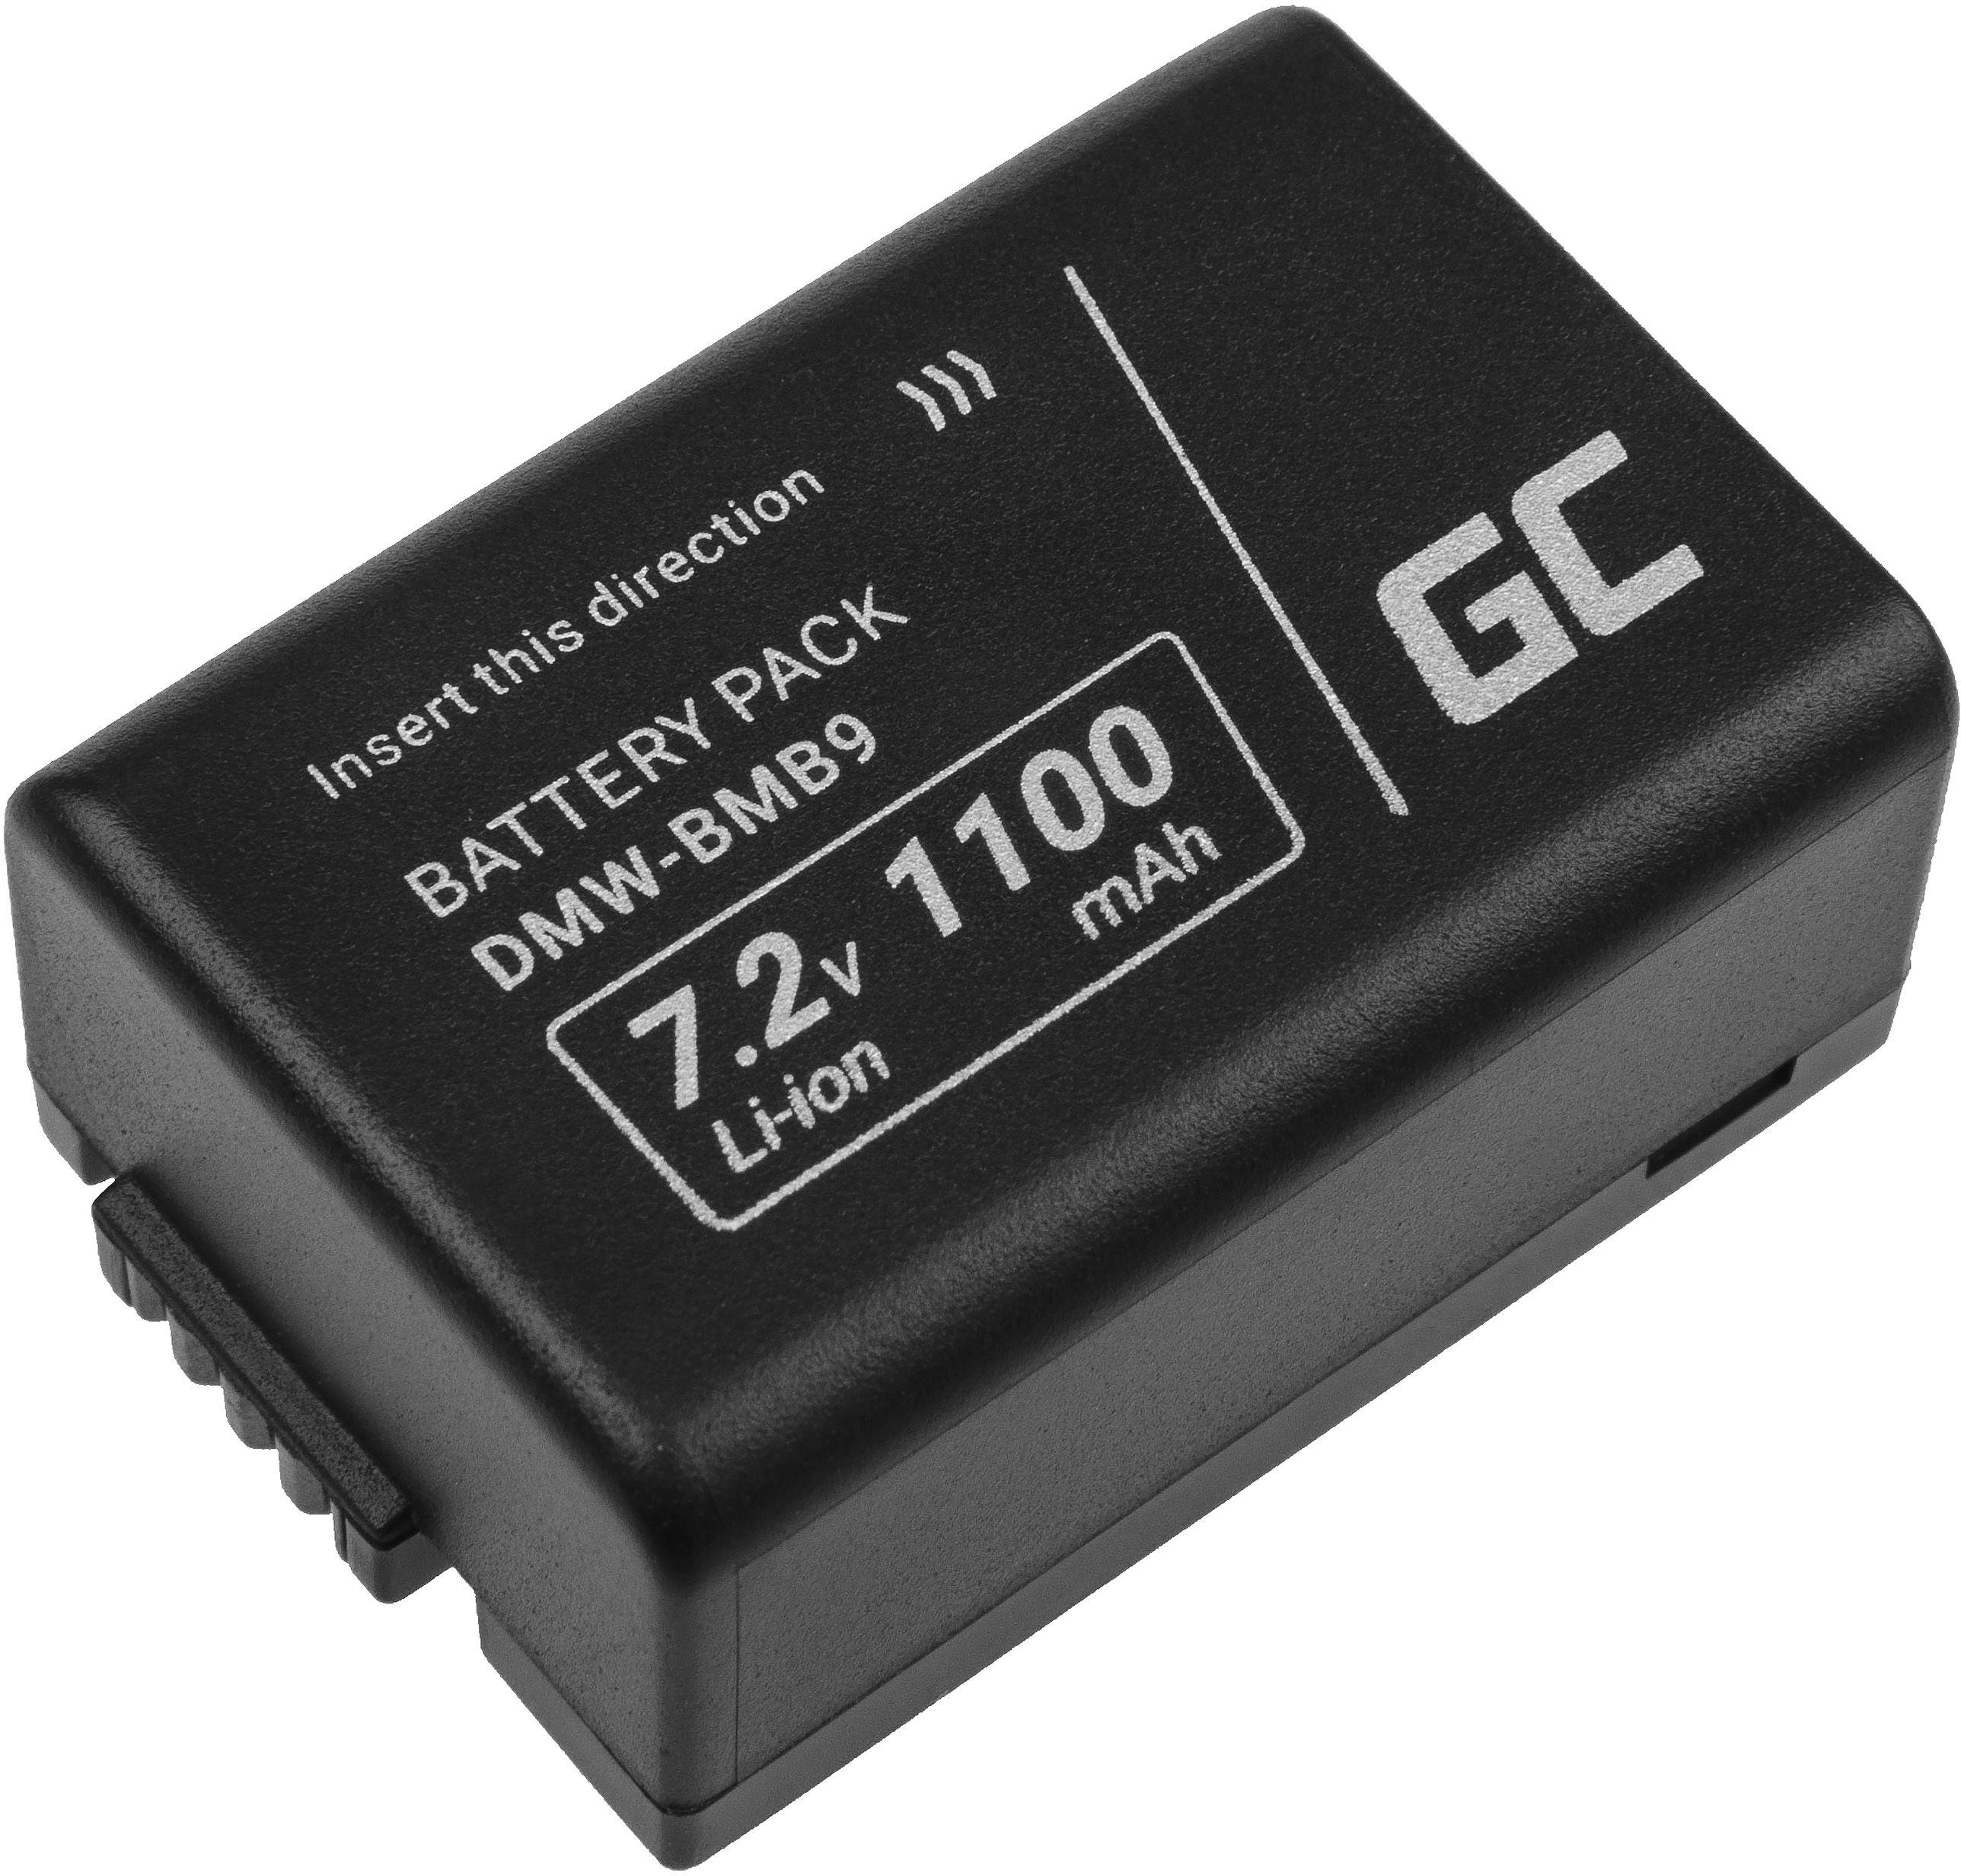 Akumulator Bateria Green Cell  DMW-BMB9E do Panasonic Lumix DMC FZ60 FZ70 FZ72 FZ82 FZ100 FZ150, Full Decoded 7.2V 850mAh